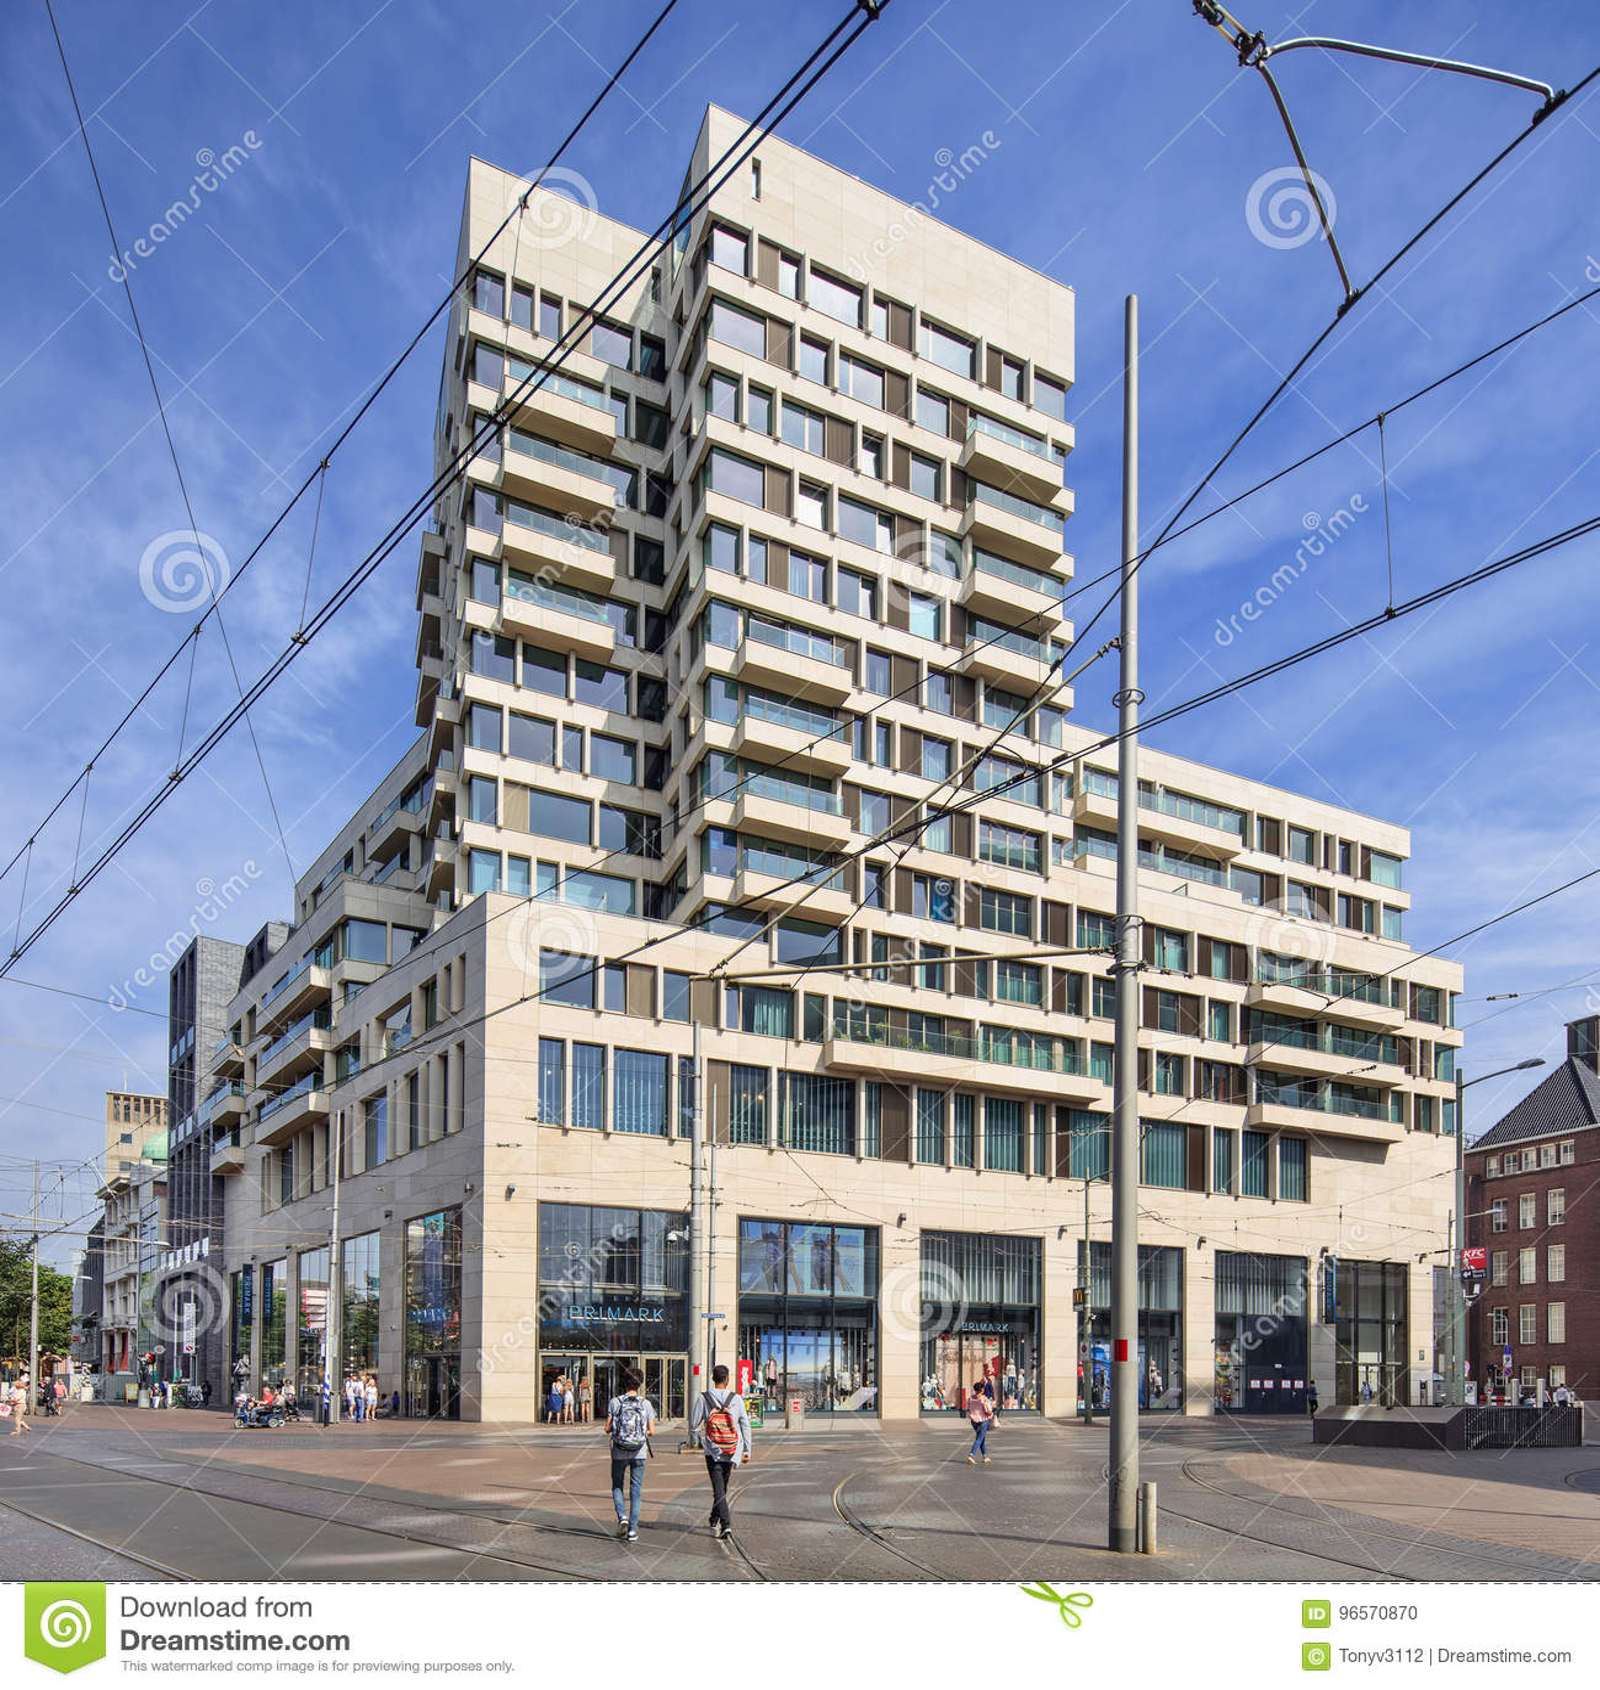 Amadeus building 2014 designed by Bedaux de Brouwer architects, The Hague, Netherlands